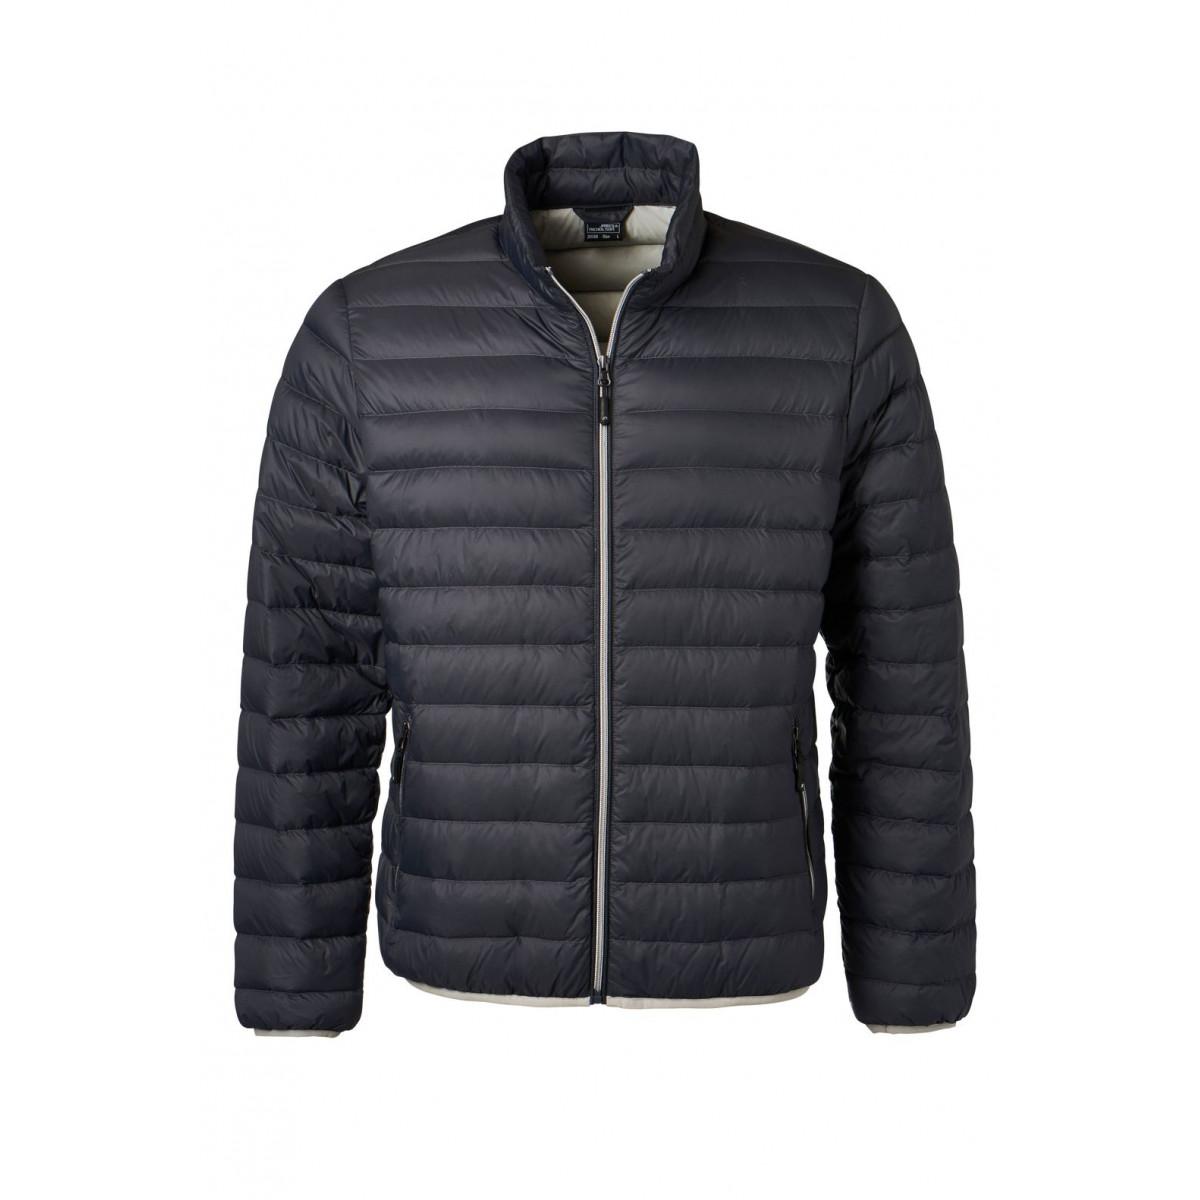 Куртка мужская JN1140 Mens Down Jacket - Темно-серый/Серебряный